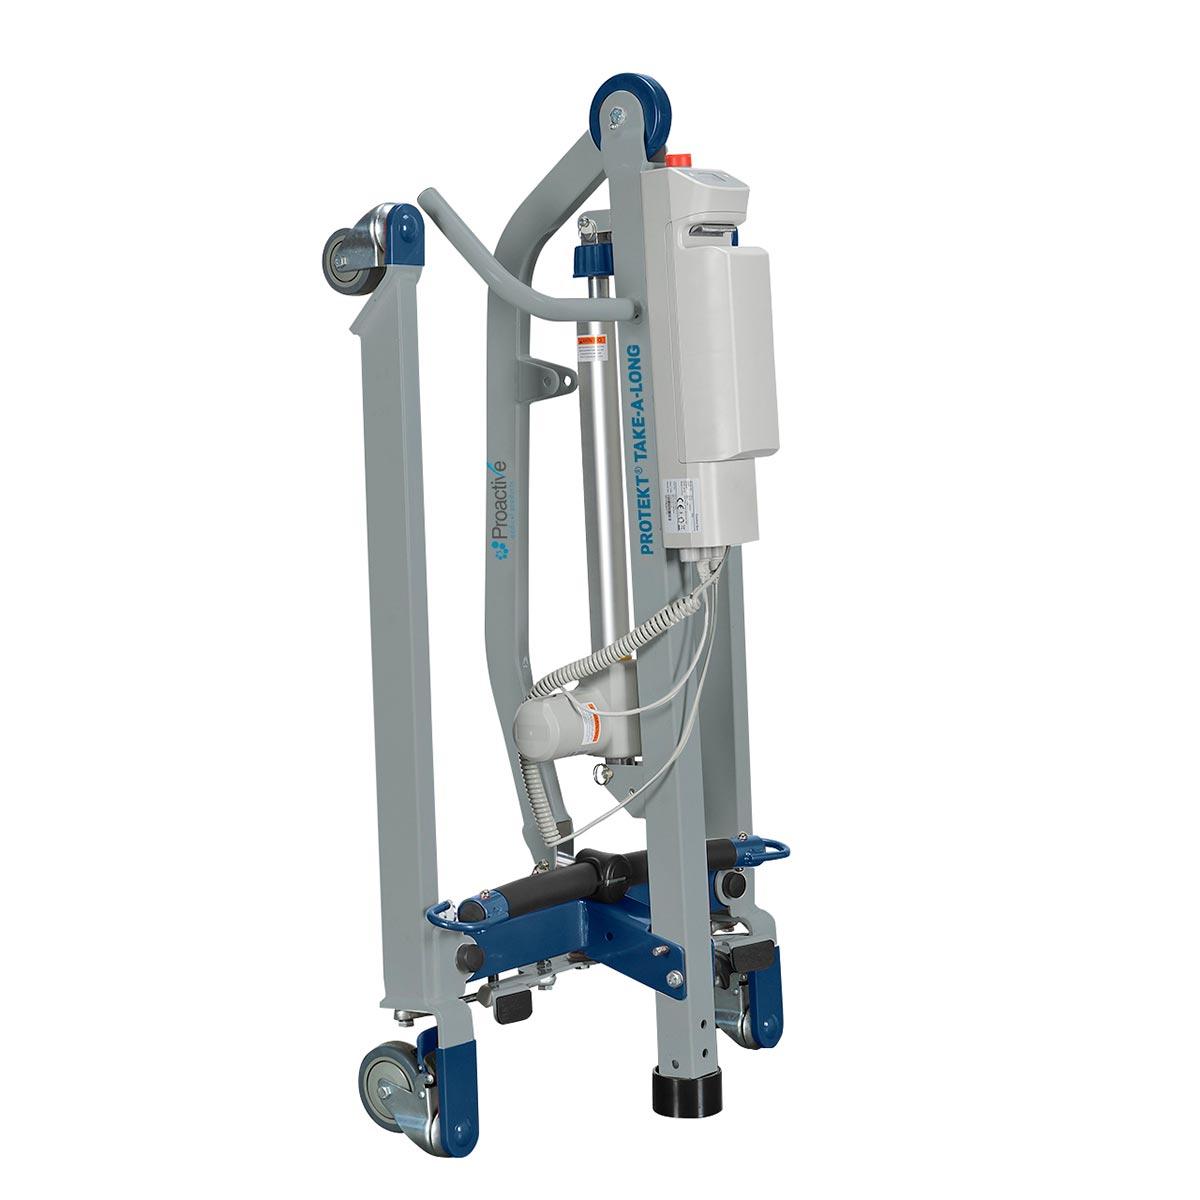 Protekt Portable Full Body Electric Lift